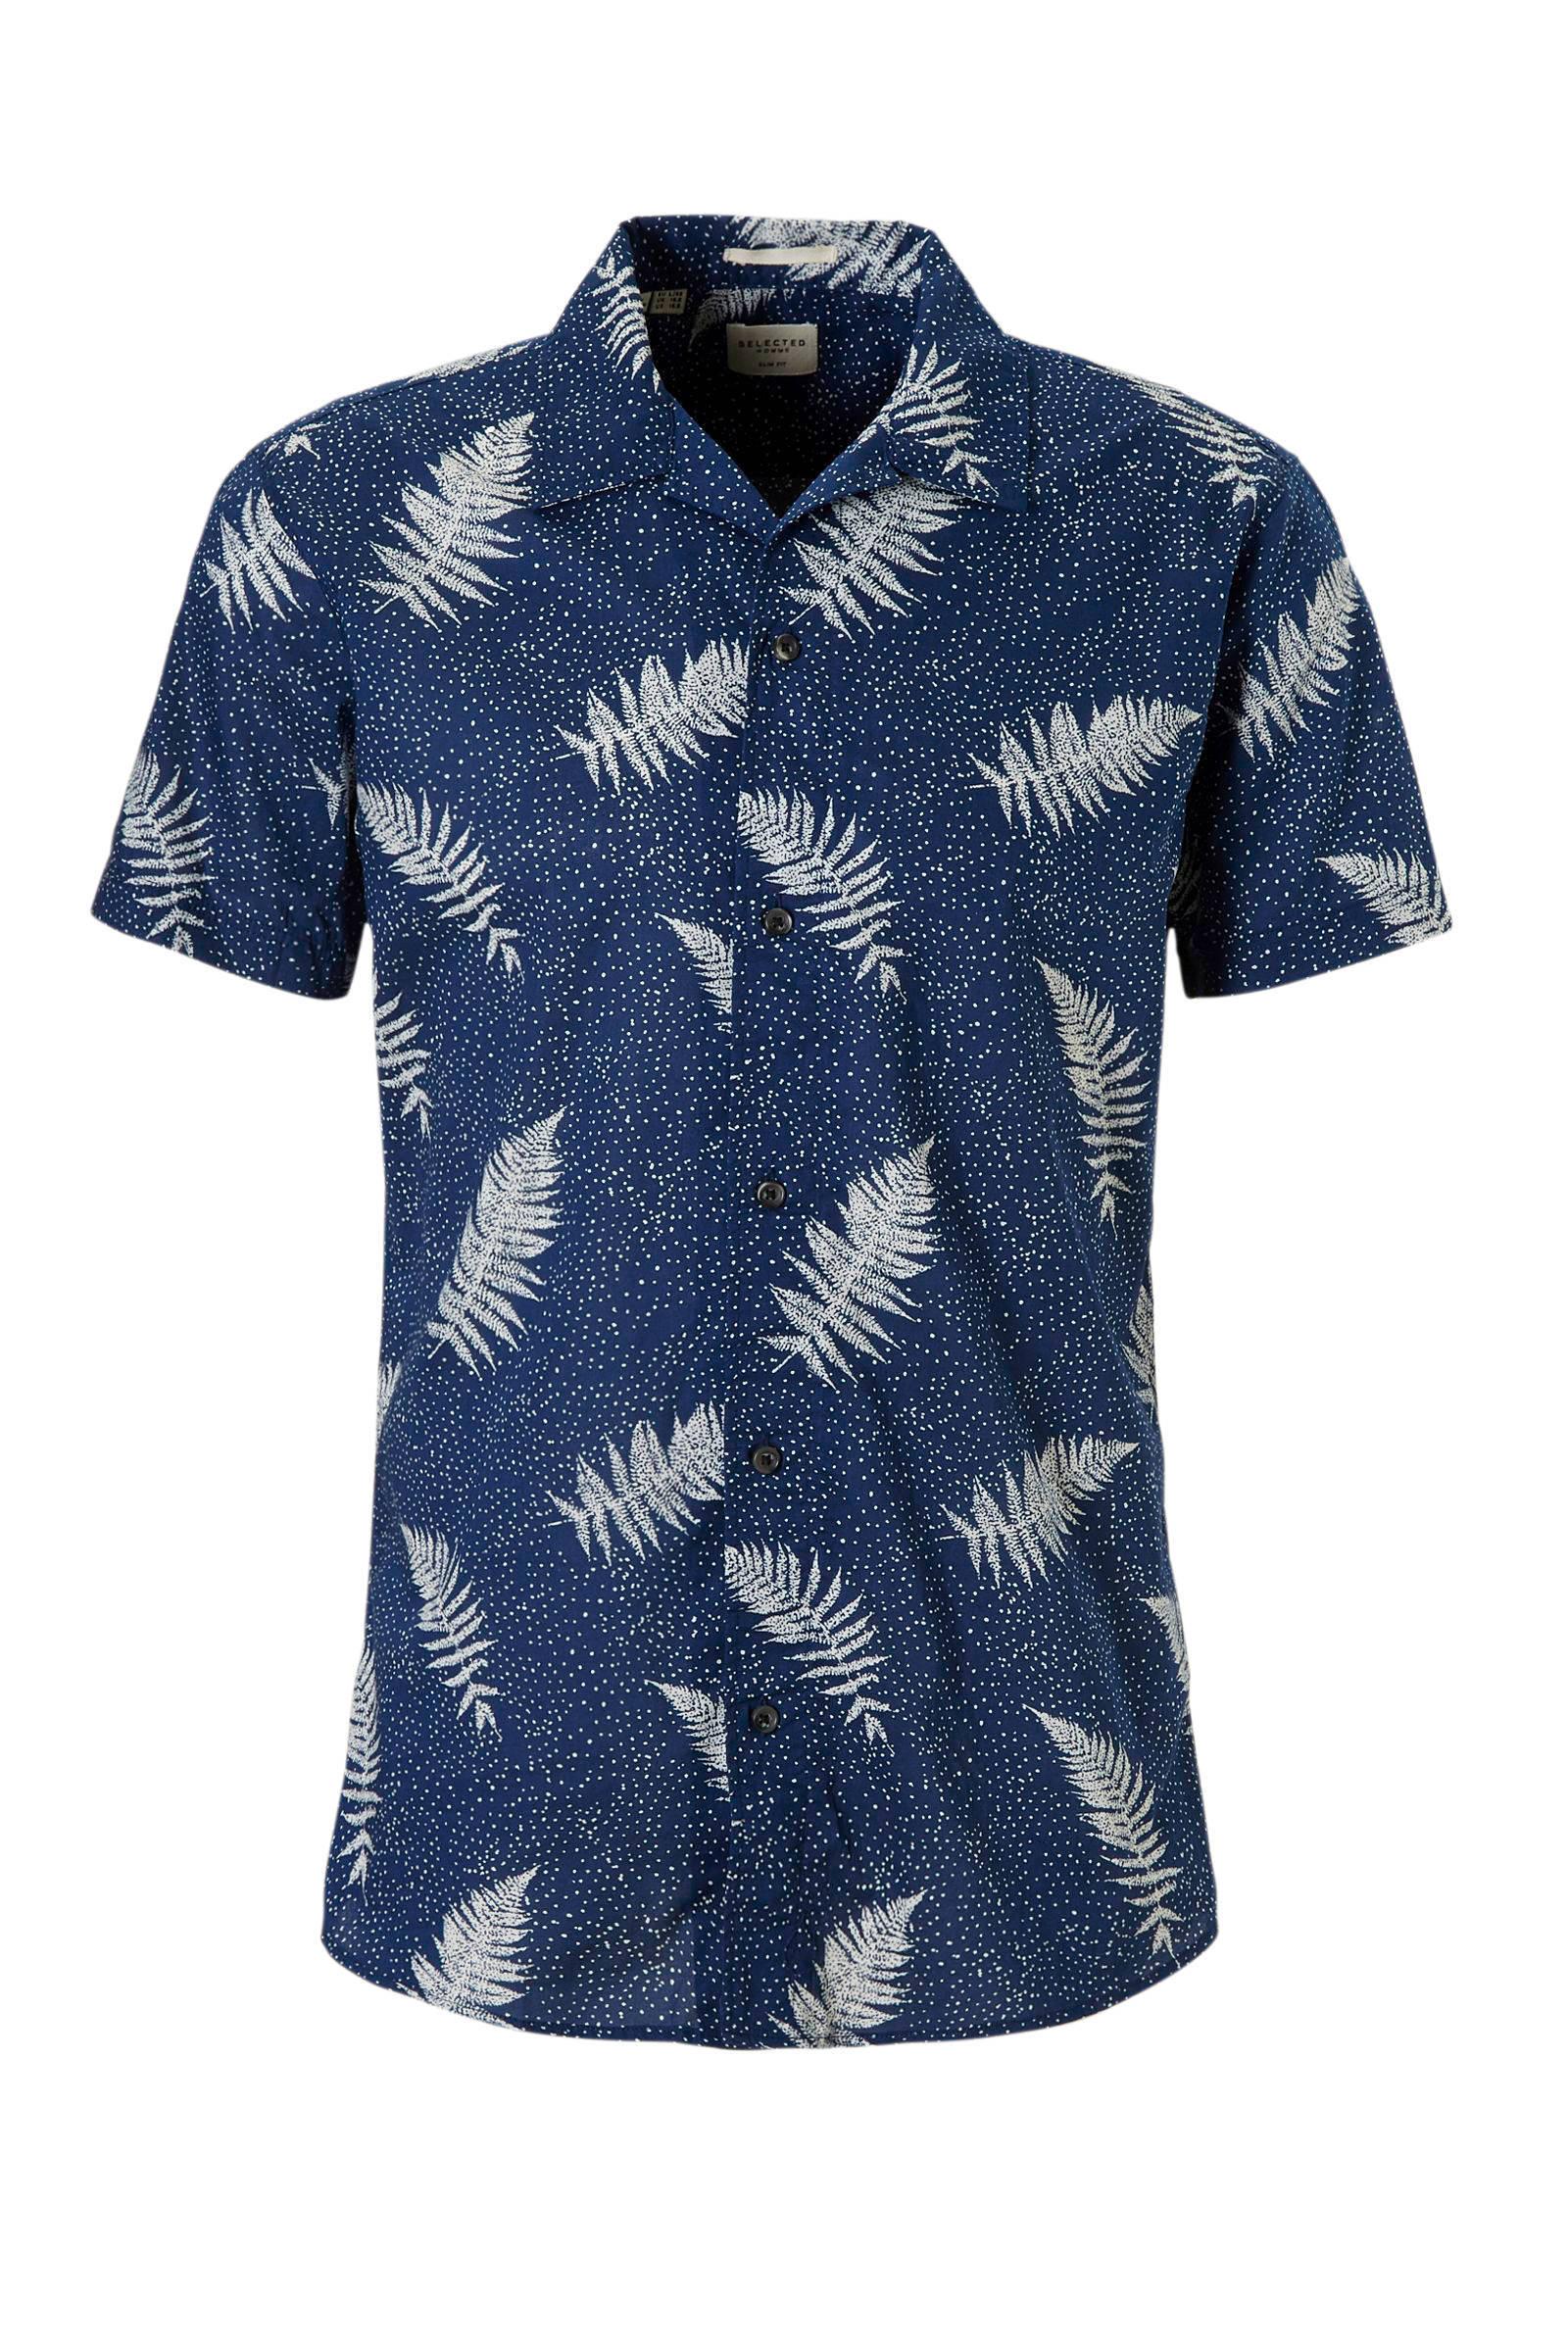 hippe overhemden slim fit